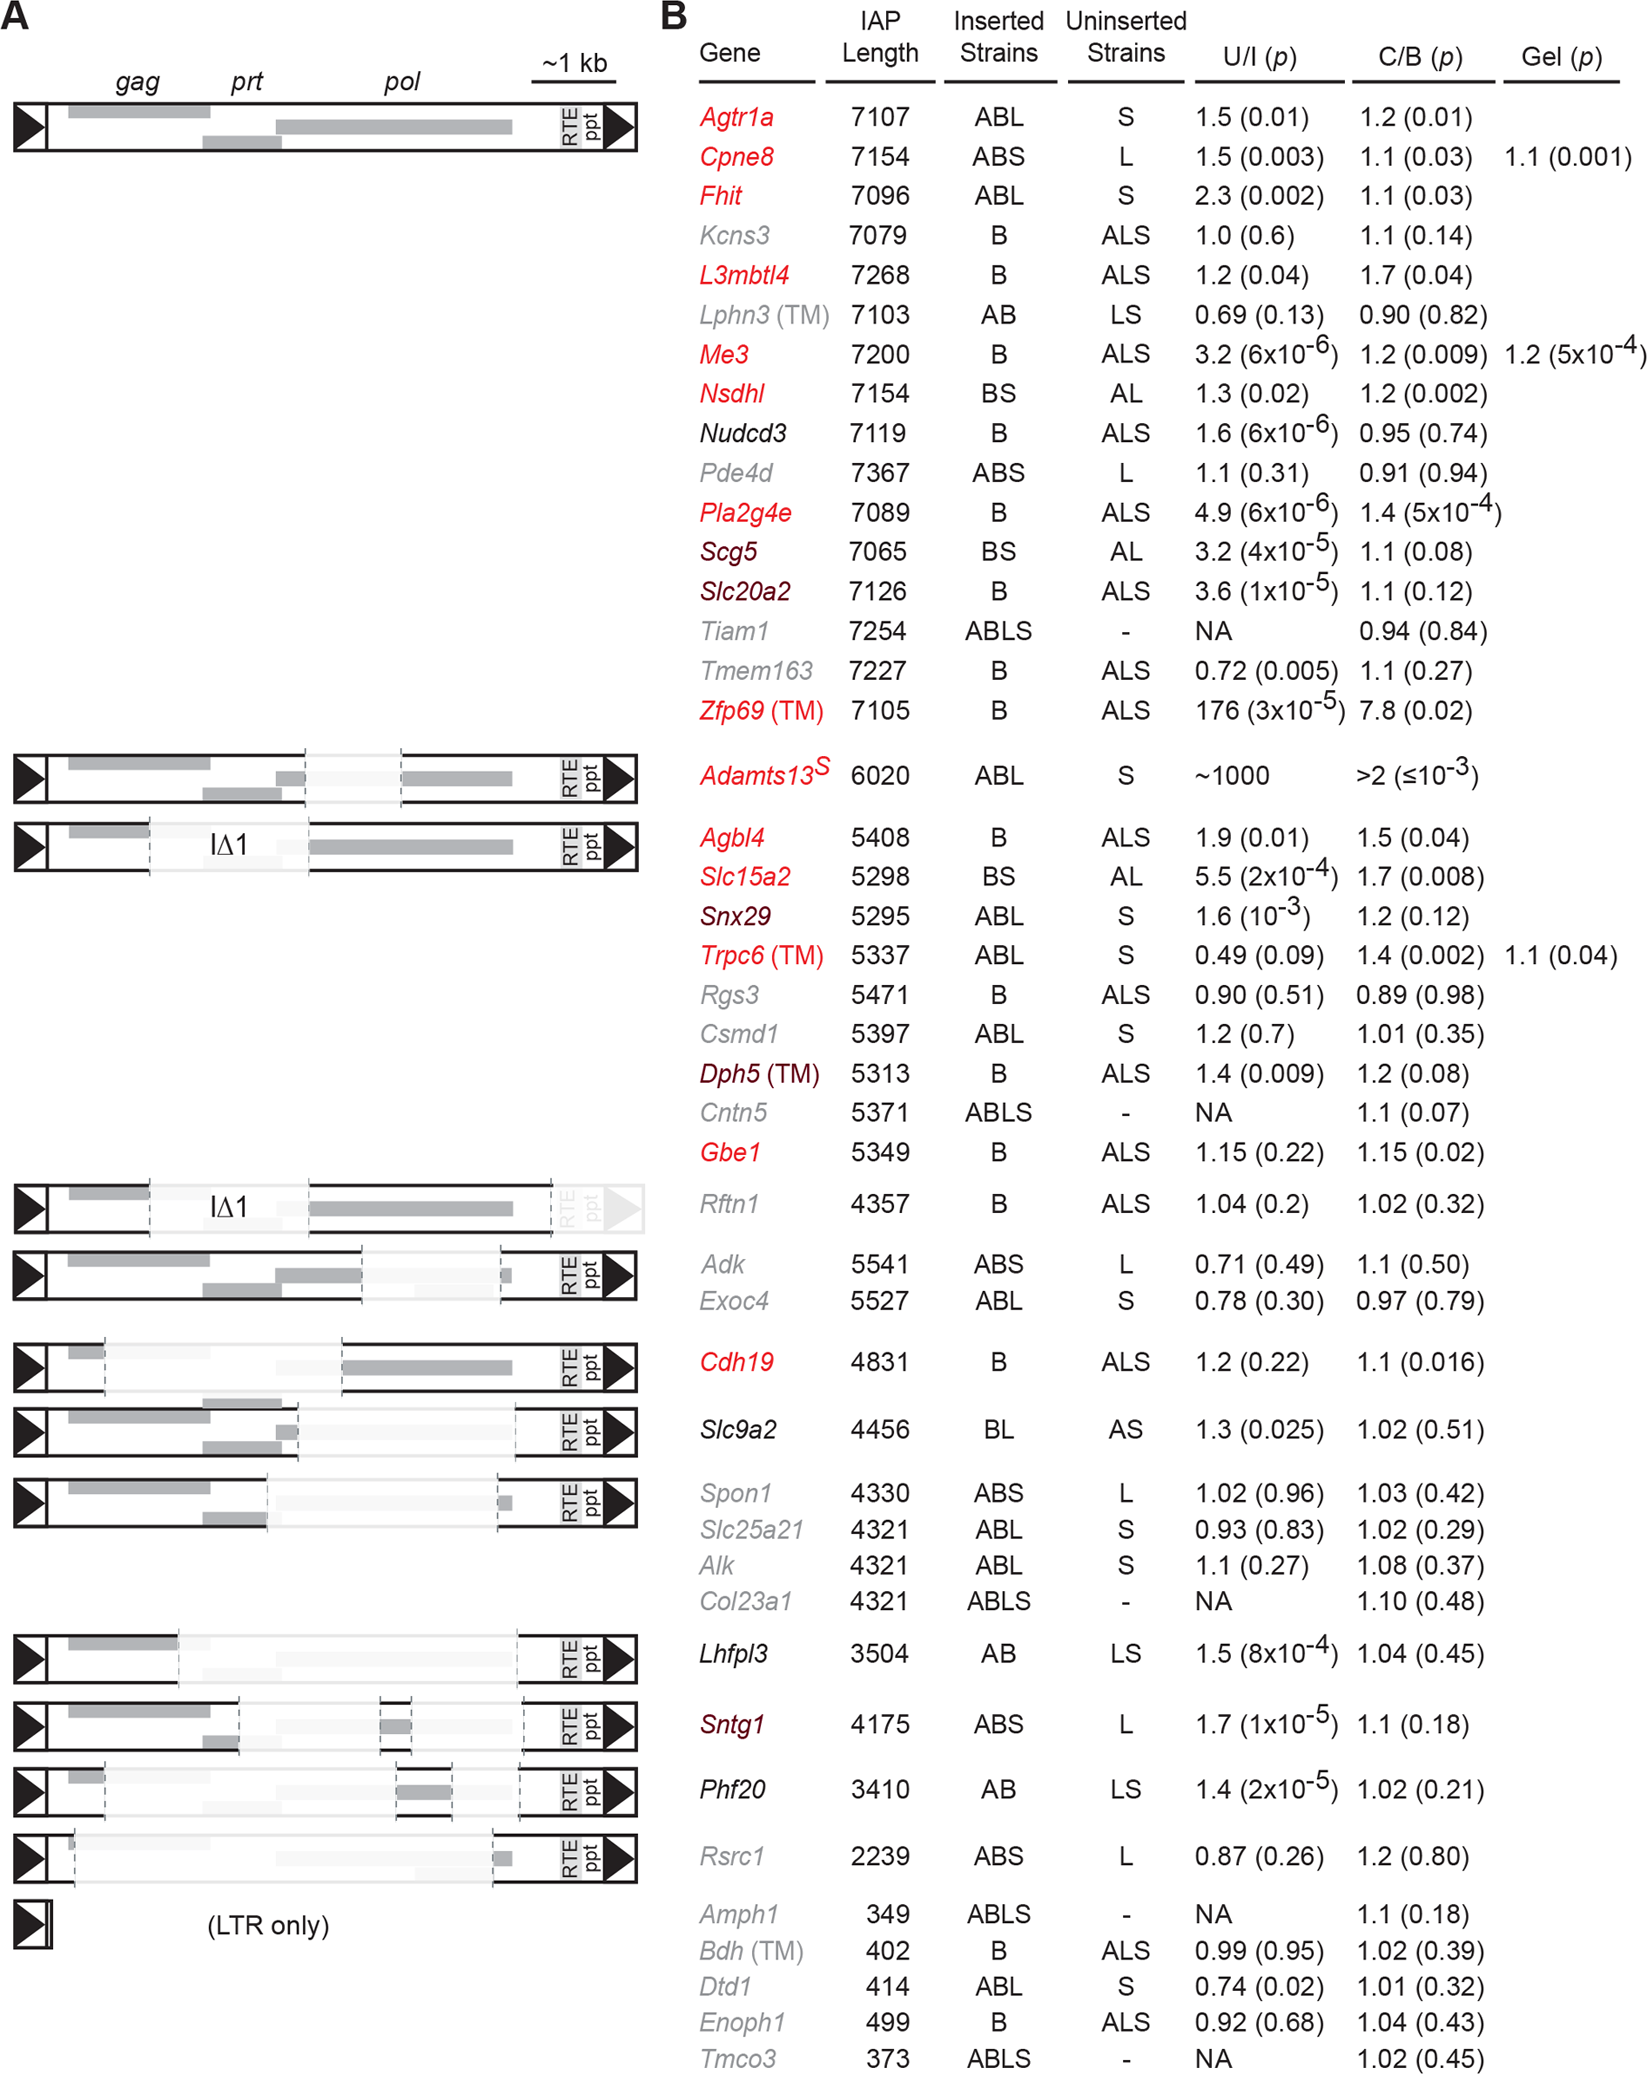 <i>Nxf1</i><sup><i>CAST</i></sup> congenic allele suppresses a diversity of IAP elements in the B6 genome.